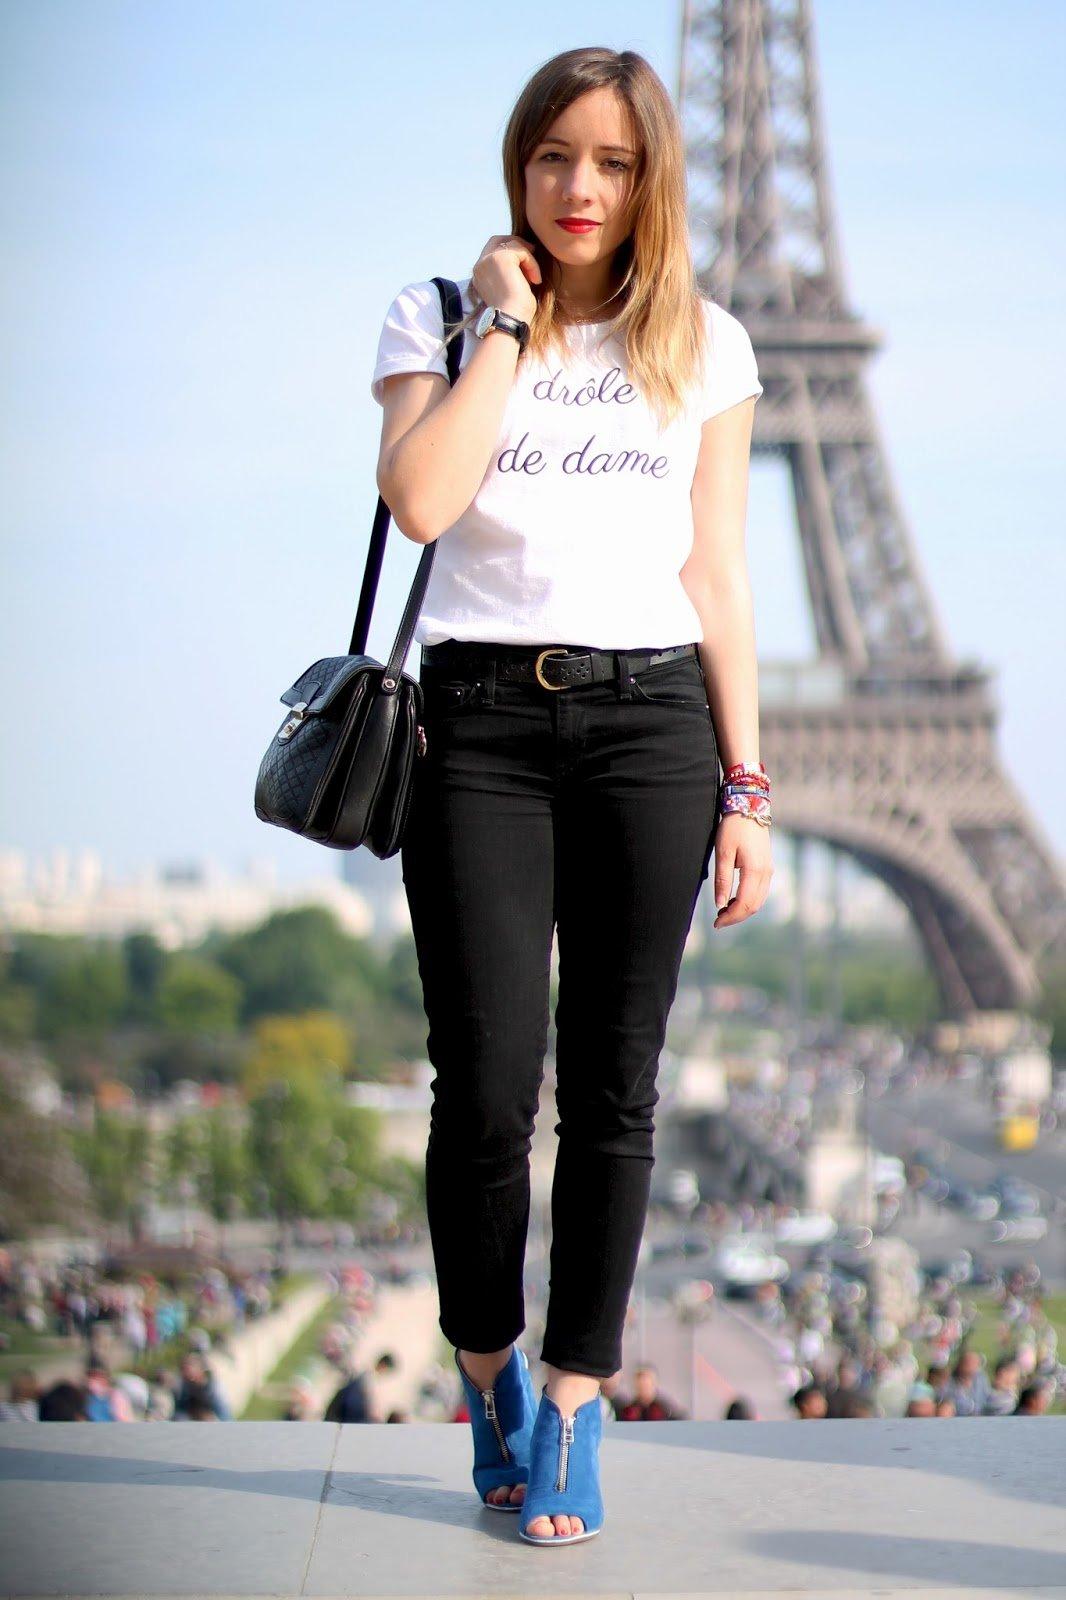 Tour Eiffel Trocadéro photos